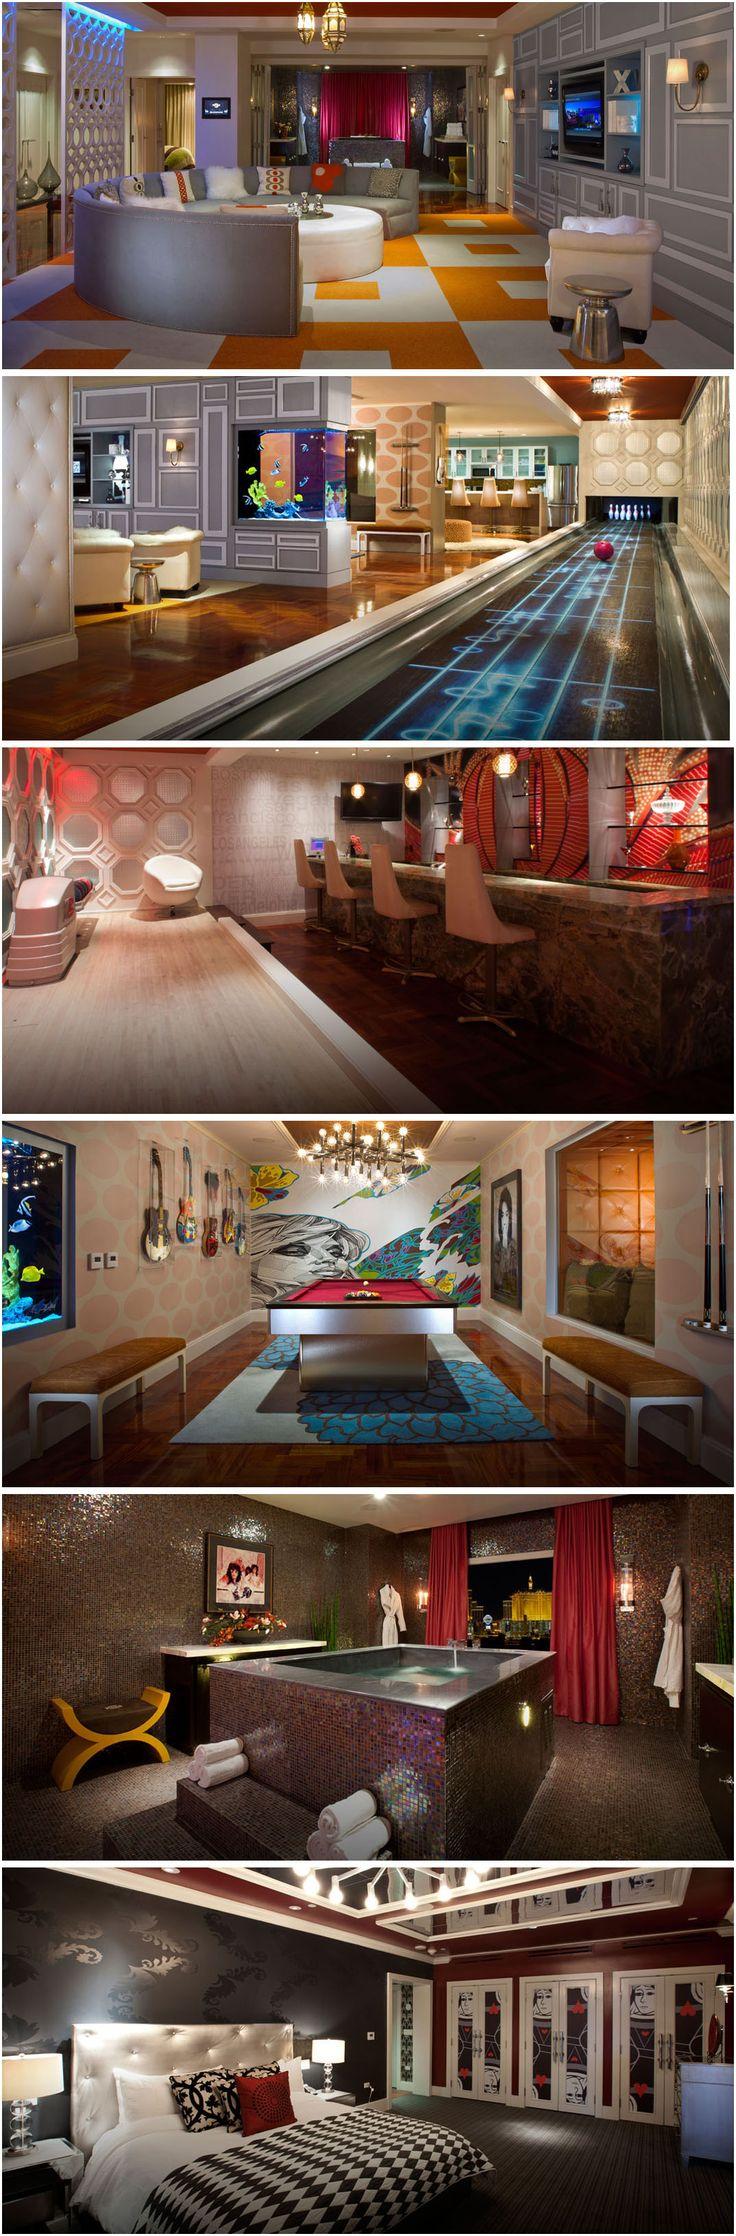 97 Best Images About Pretty Vegas Hotel Suites On Pinterest Penthouse Suite Villas And The